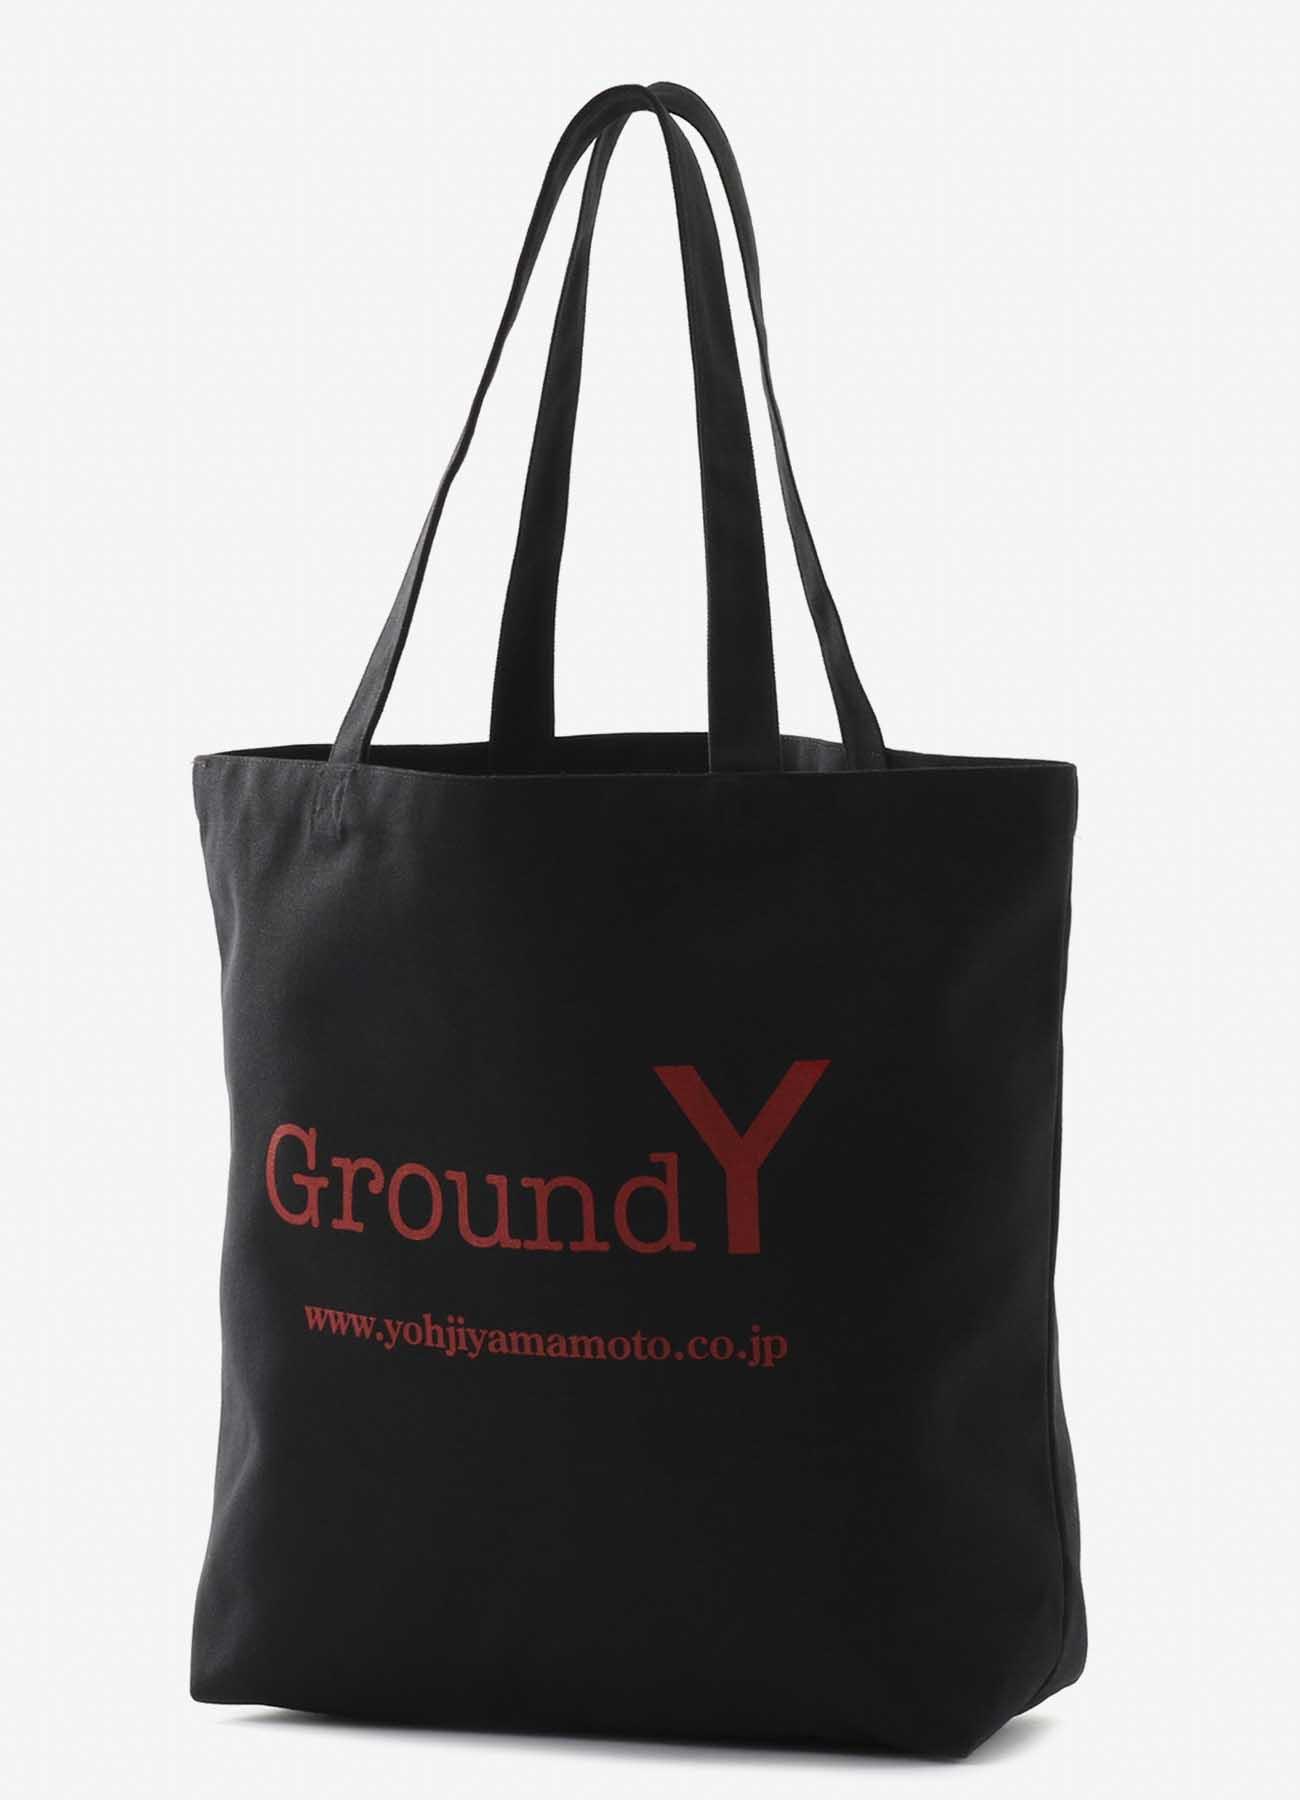 GroundY LOGO帆布包